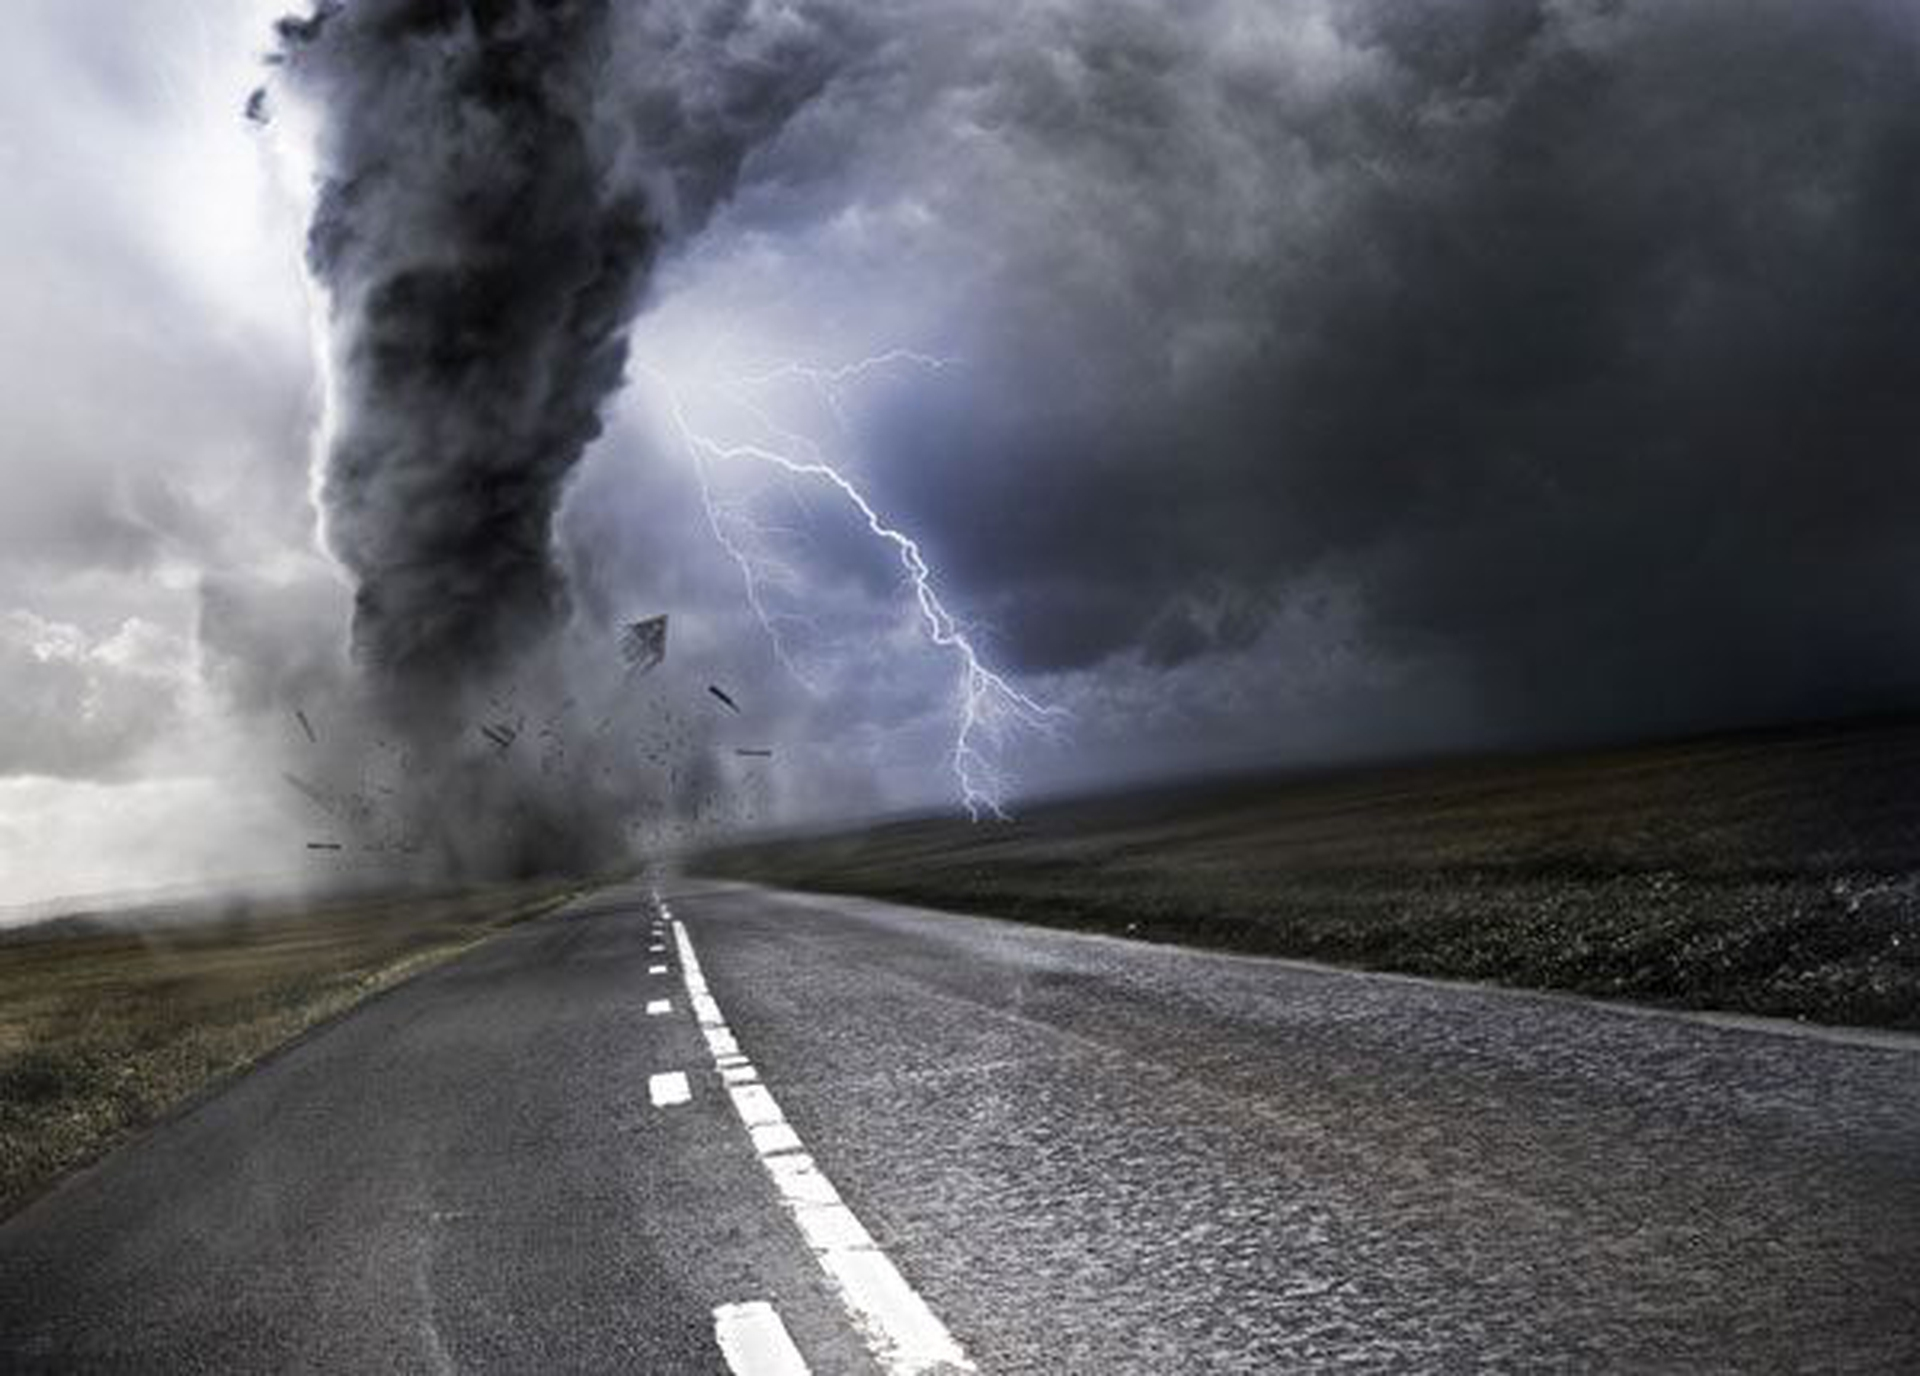 Driving in Hazardous Road Conditions